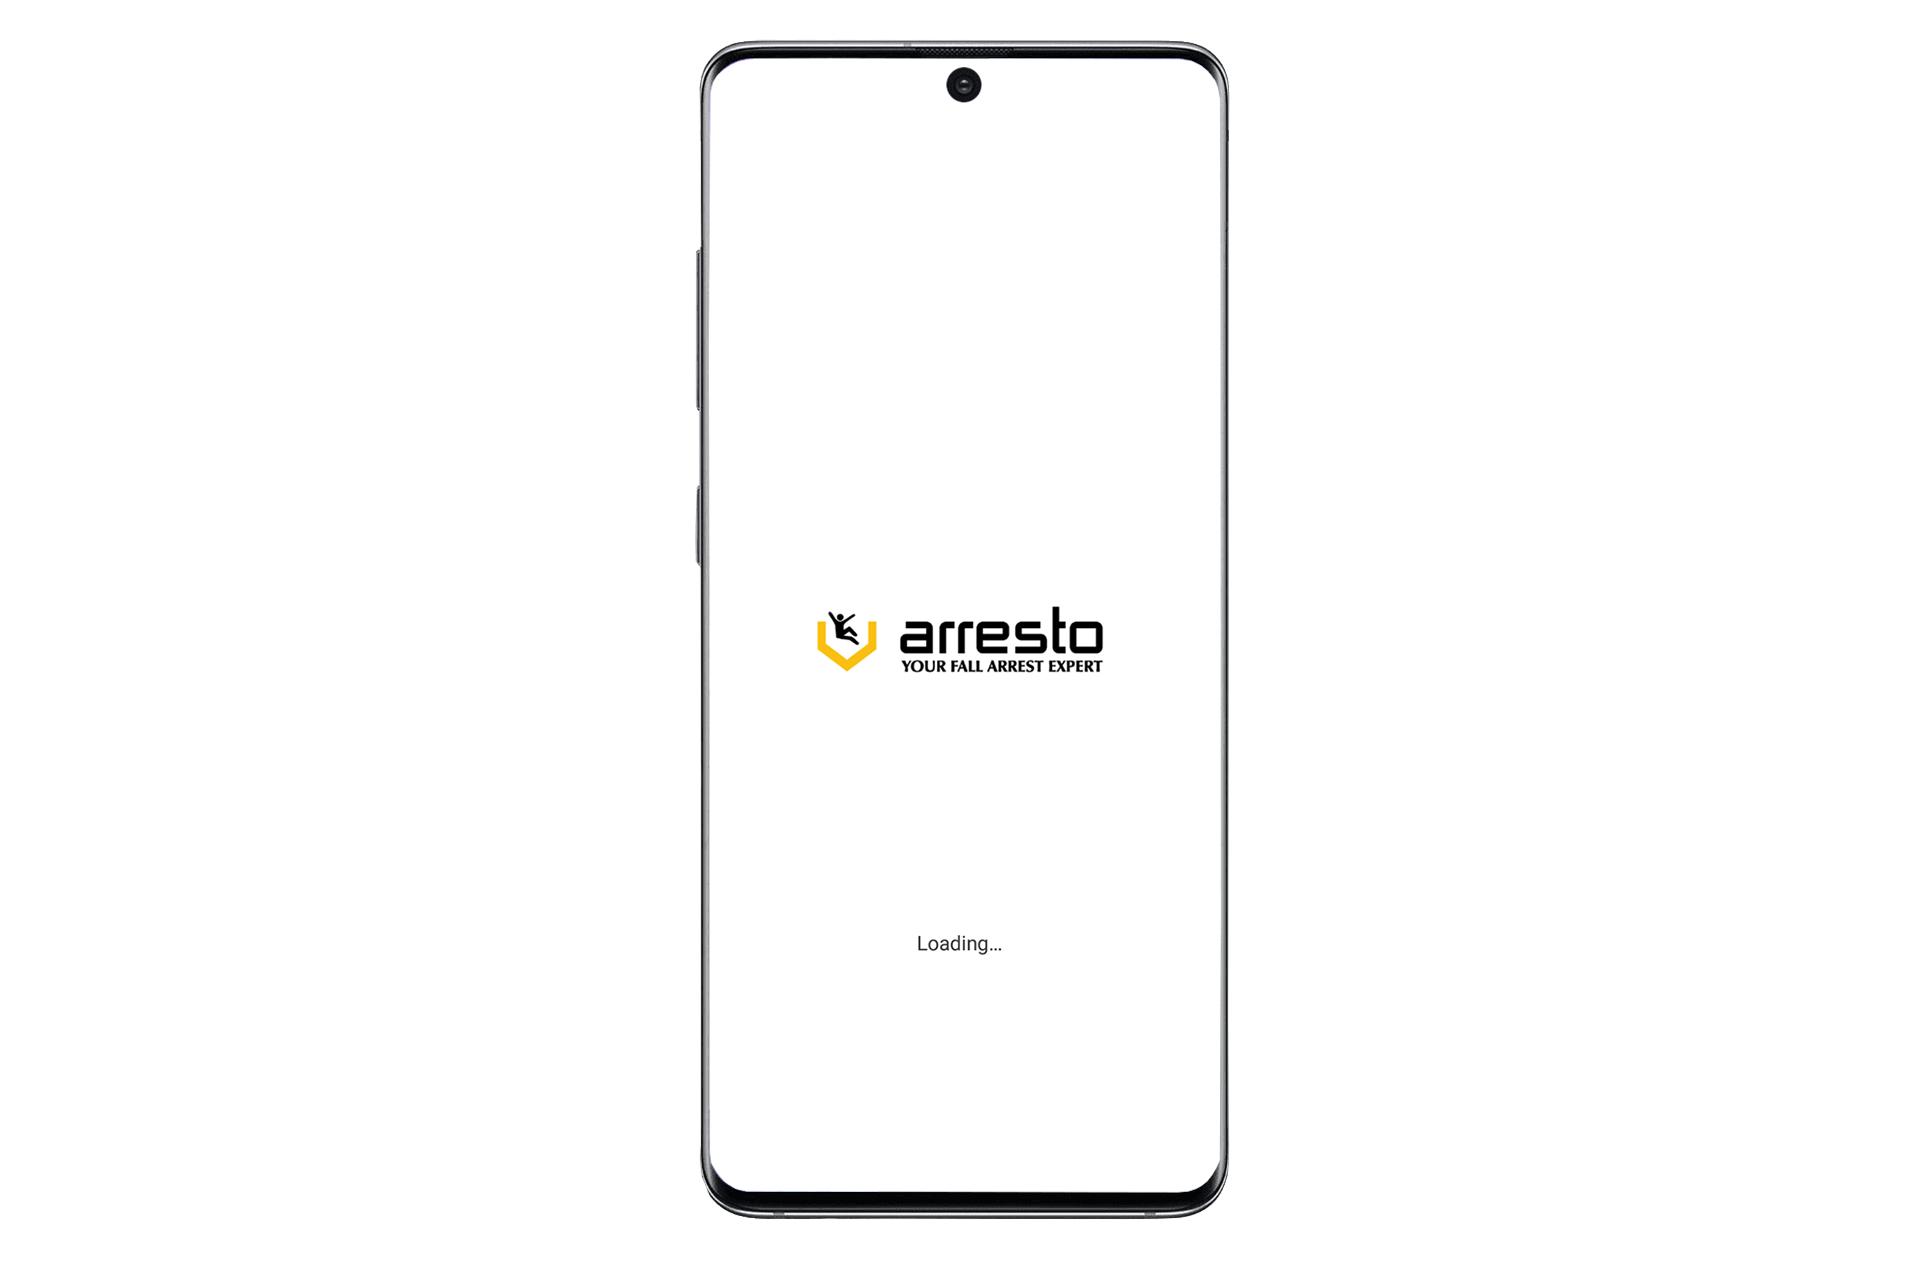 arresto-android-01